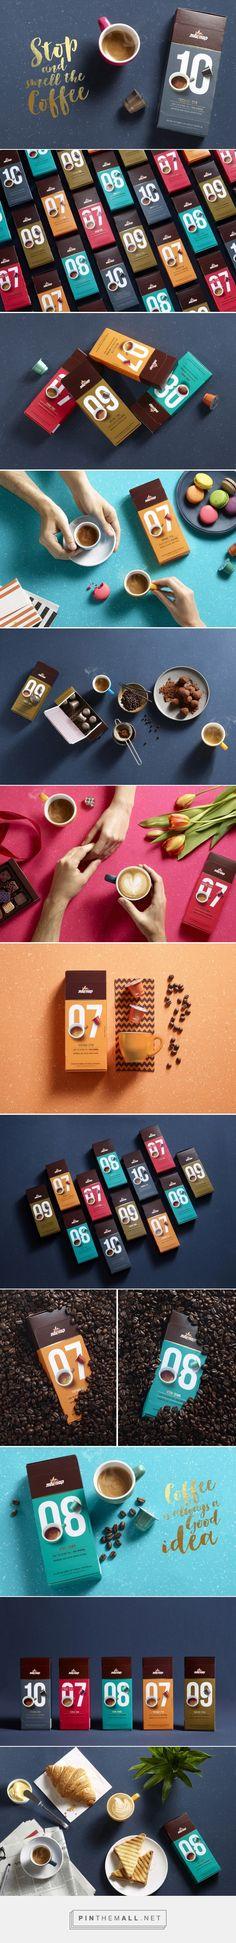 Elite Coffee Capsules packaging designed by Shake Design- Maayan Reshef מעיין רשף (Israel) - http://www.packagingoftheworld.com/2016/03/elite-coffee-capsules.html